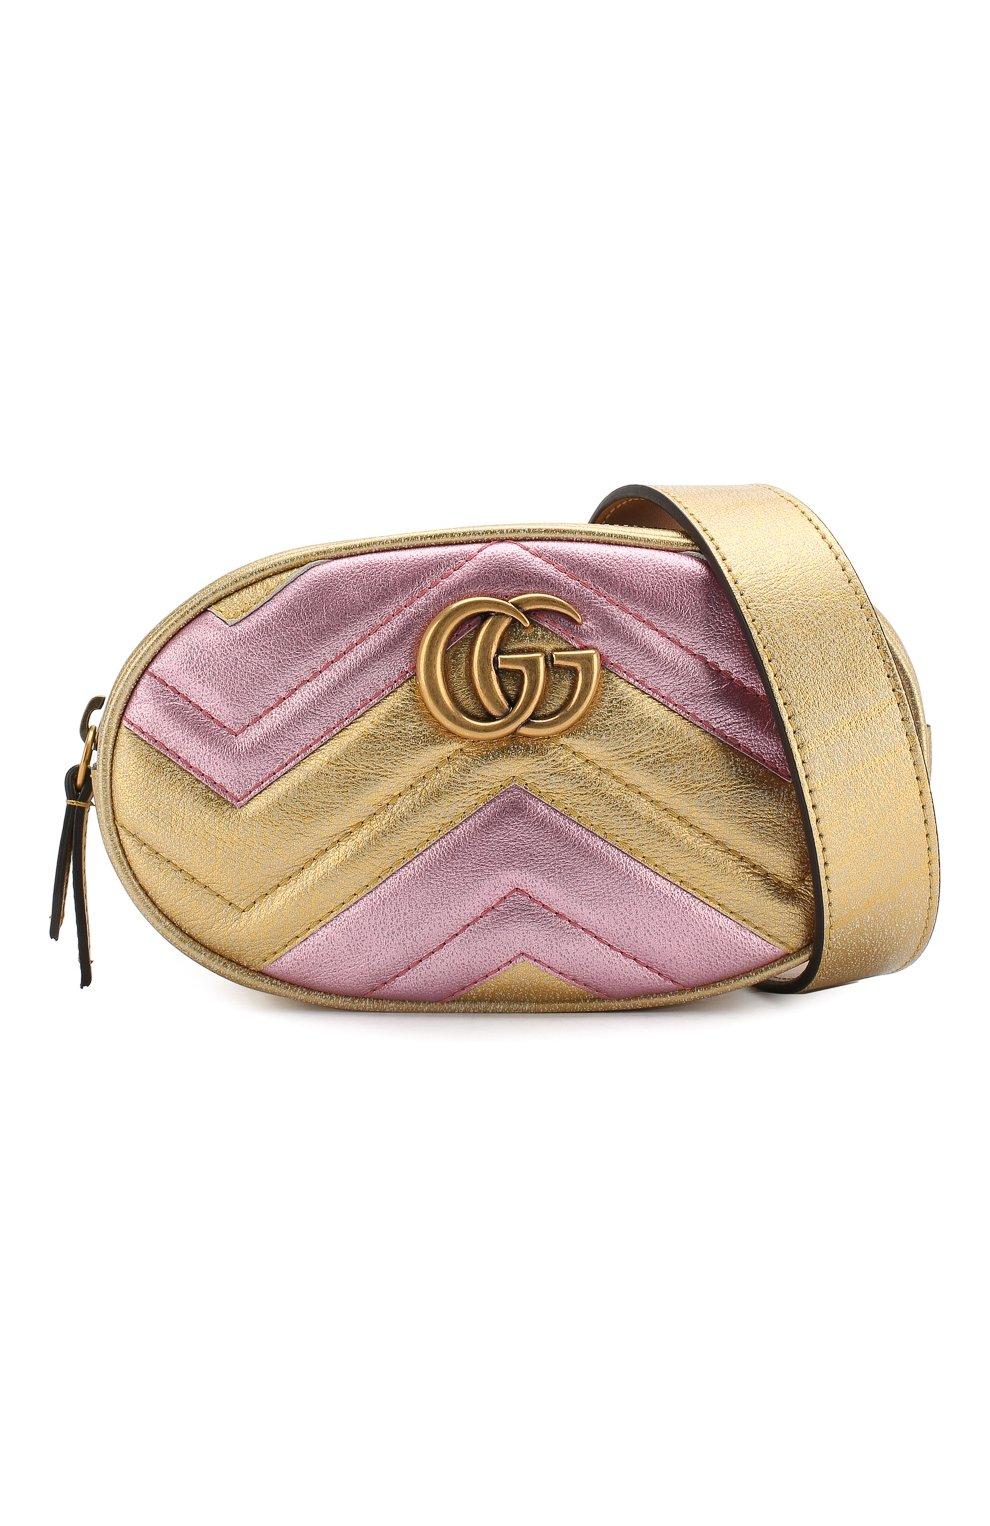 Поясная сумка GG Marmont   Фото №5